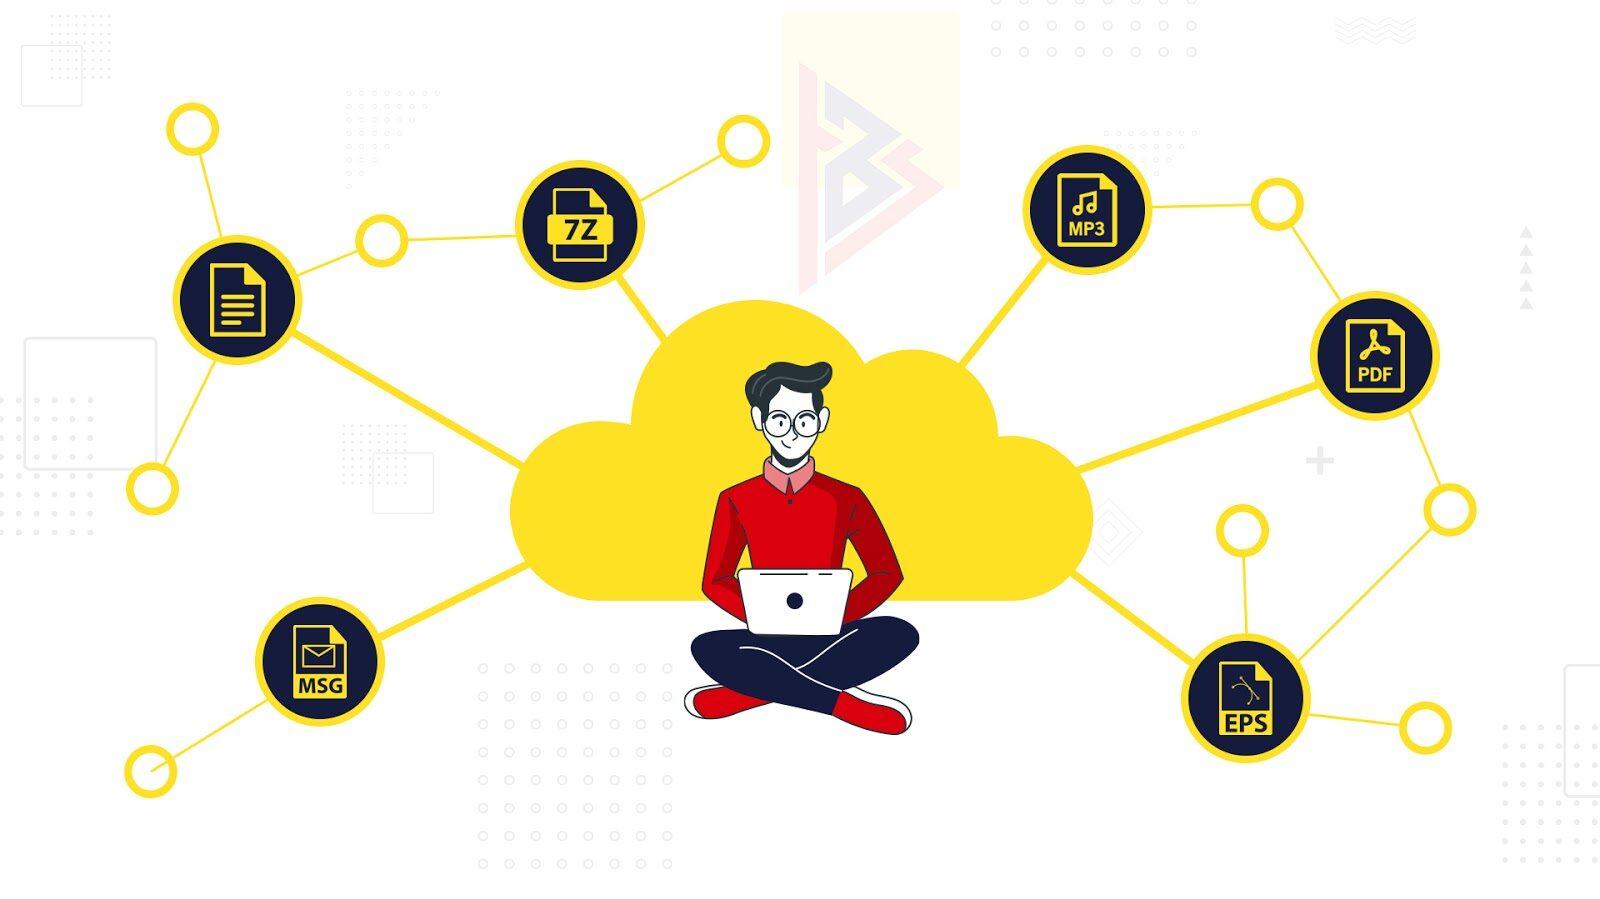 Cloud based applications